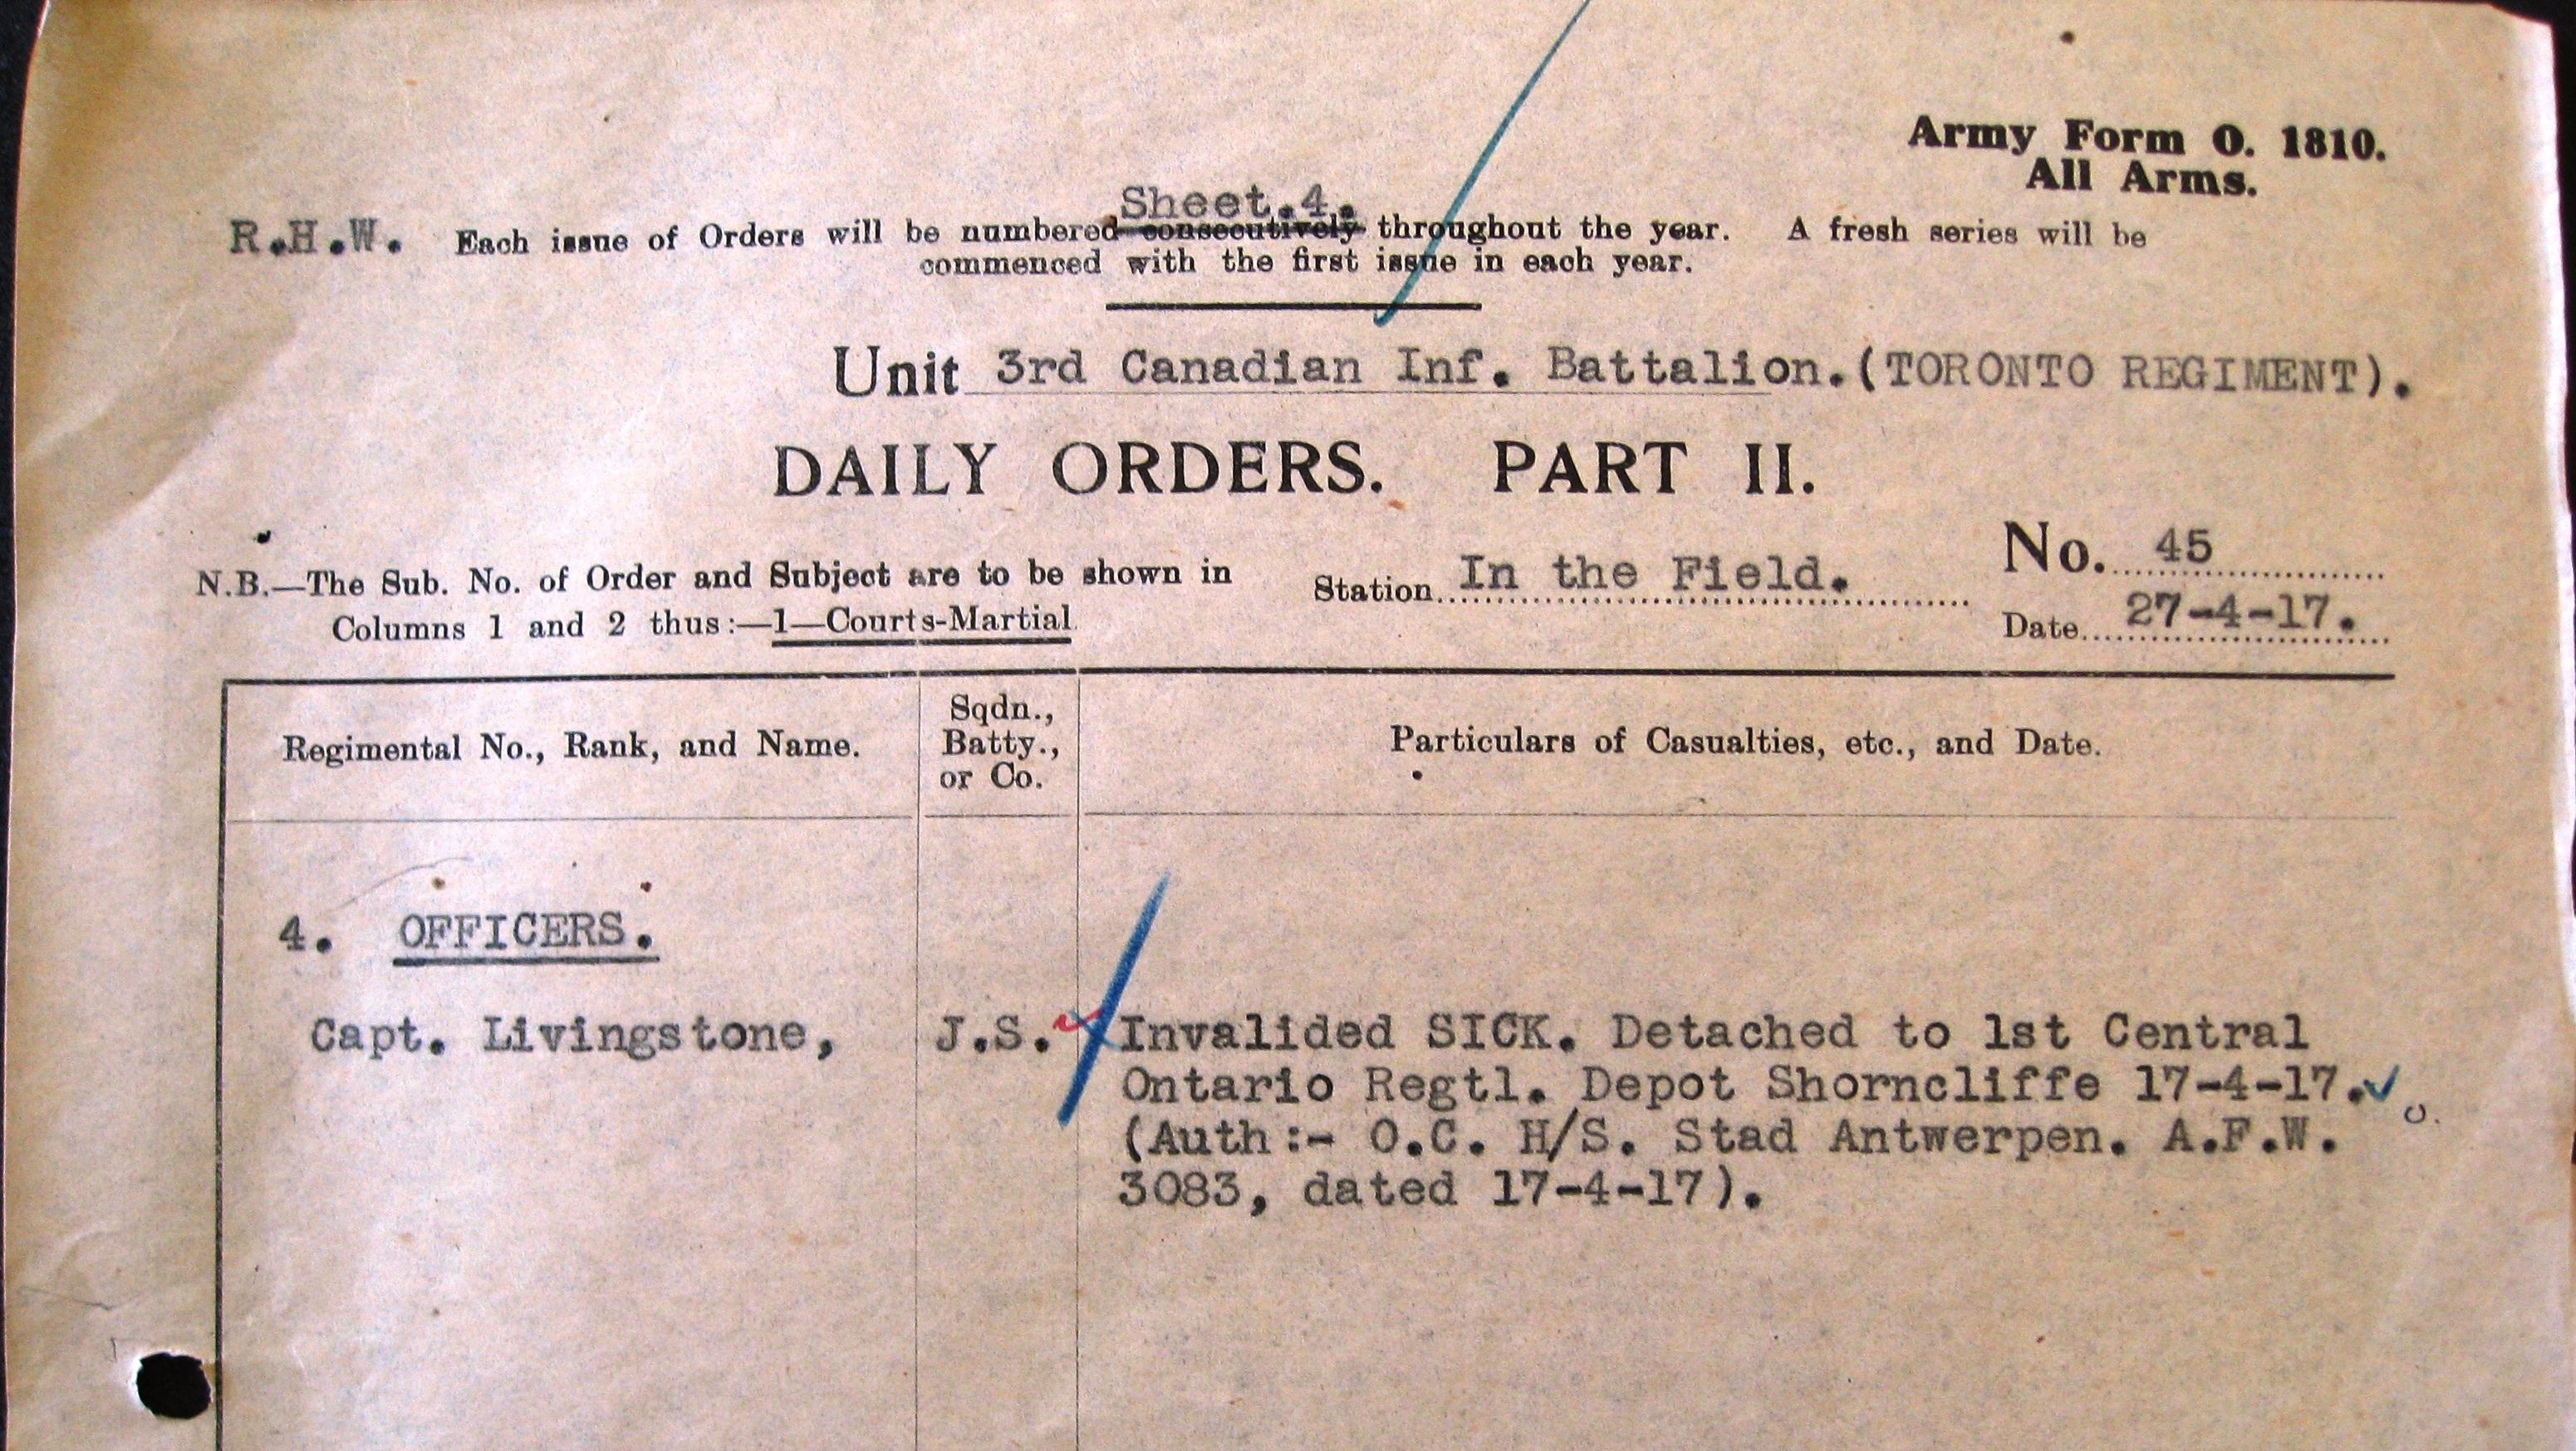 3rd Bn War Diaries 1917 The Queens Own Rifles Of Canada Dean Pickup Wiring Diagram Part Ii Orders No 45